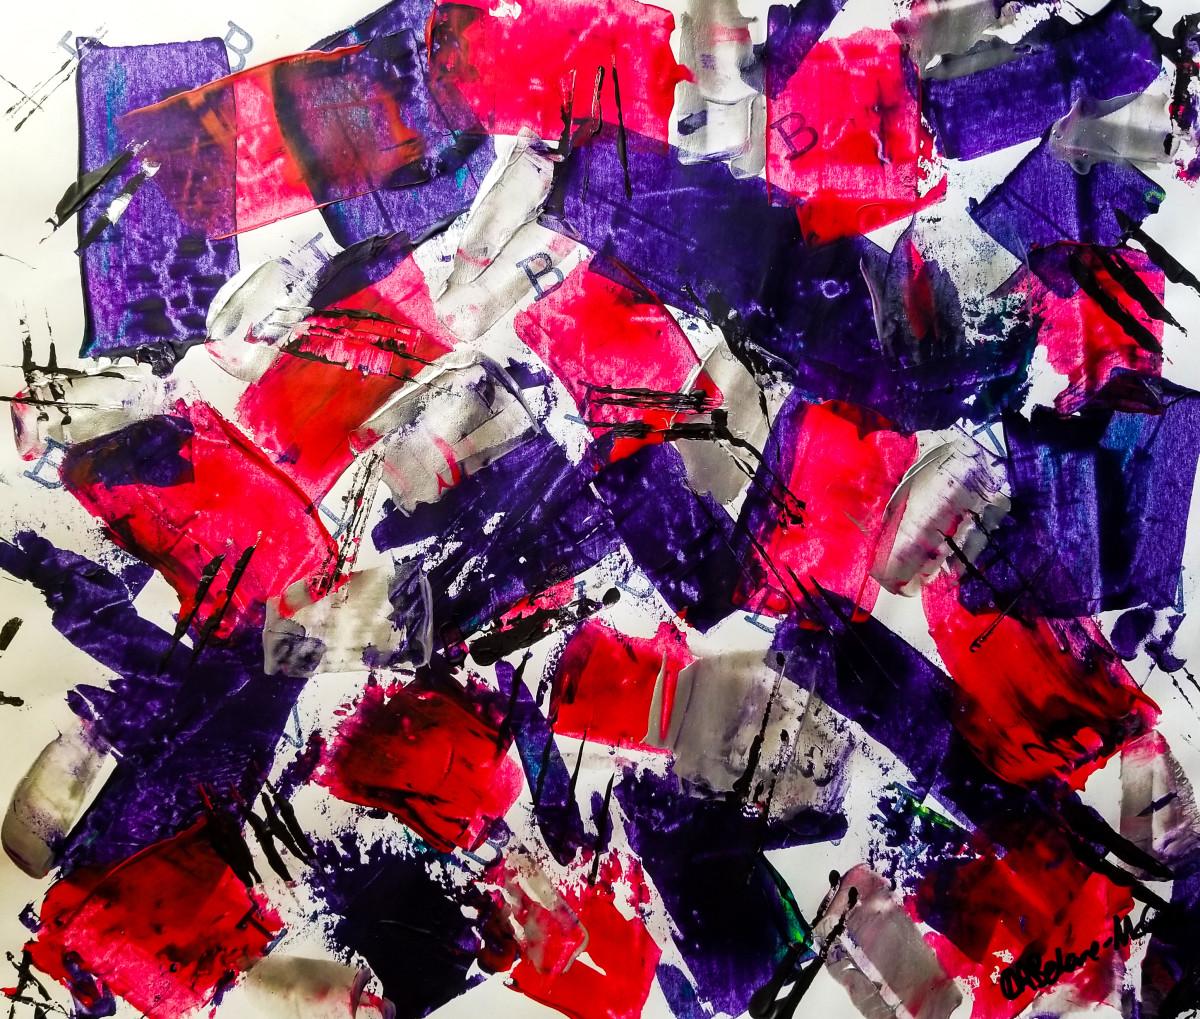 PURBLOX by Audrey Beharie-McGee